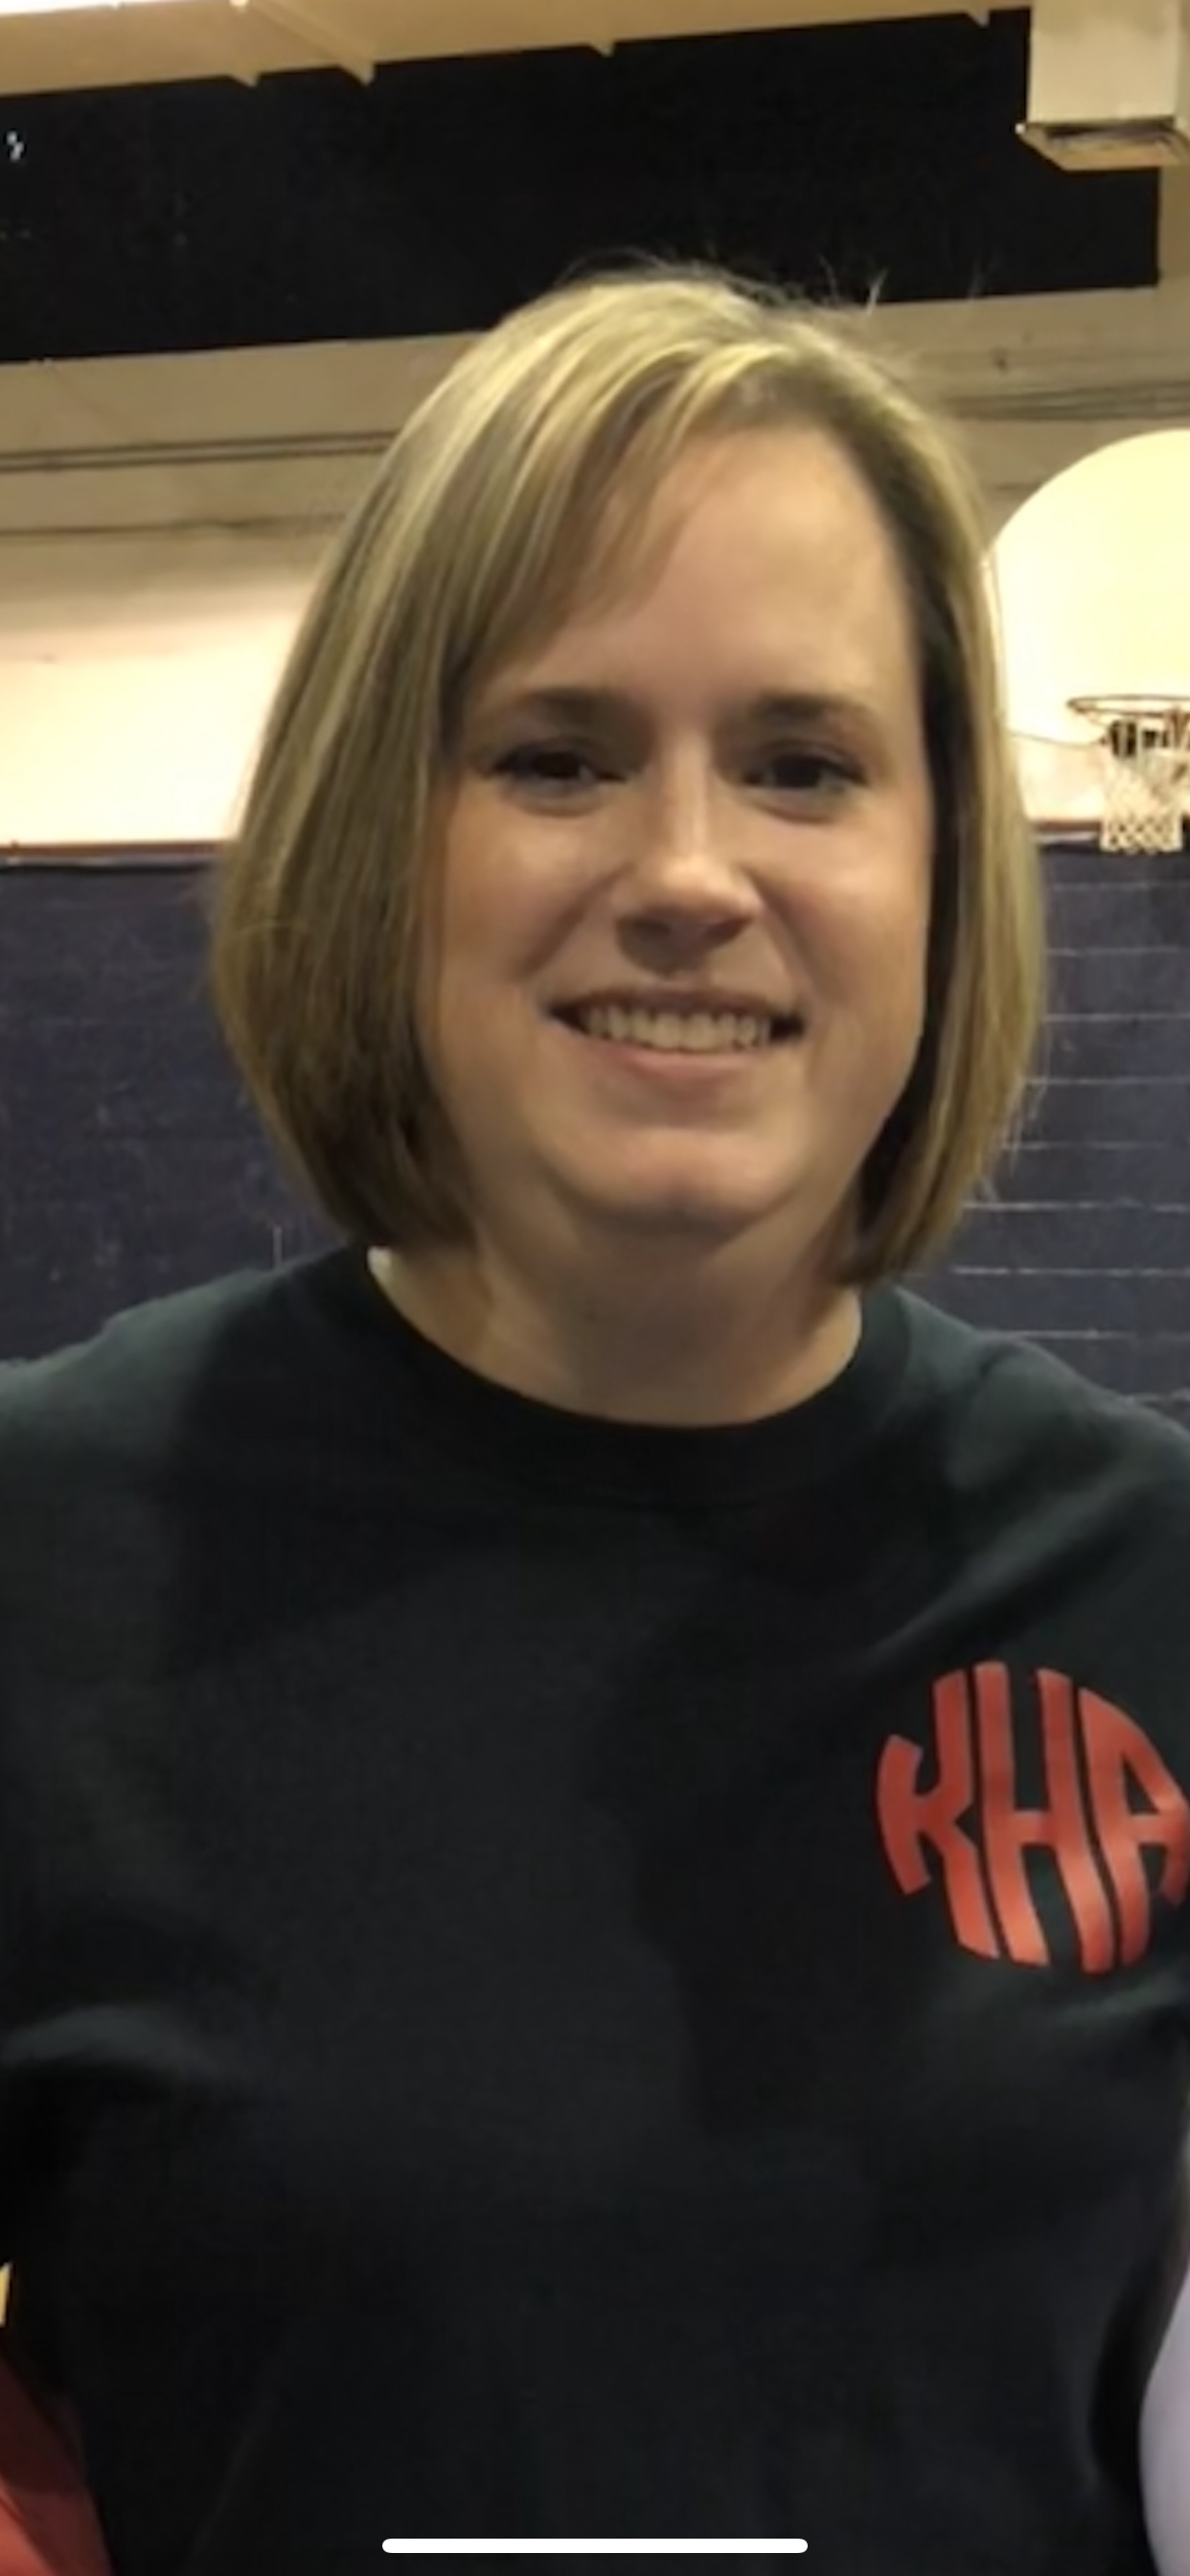 Kelly Harden